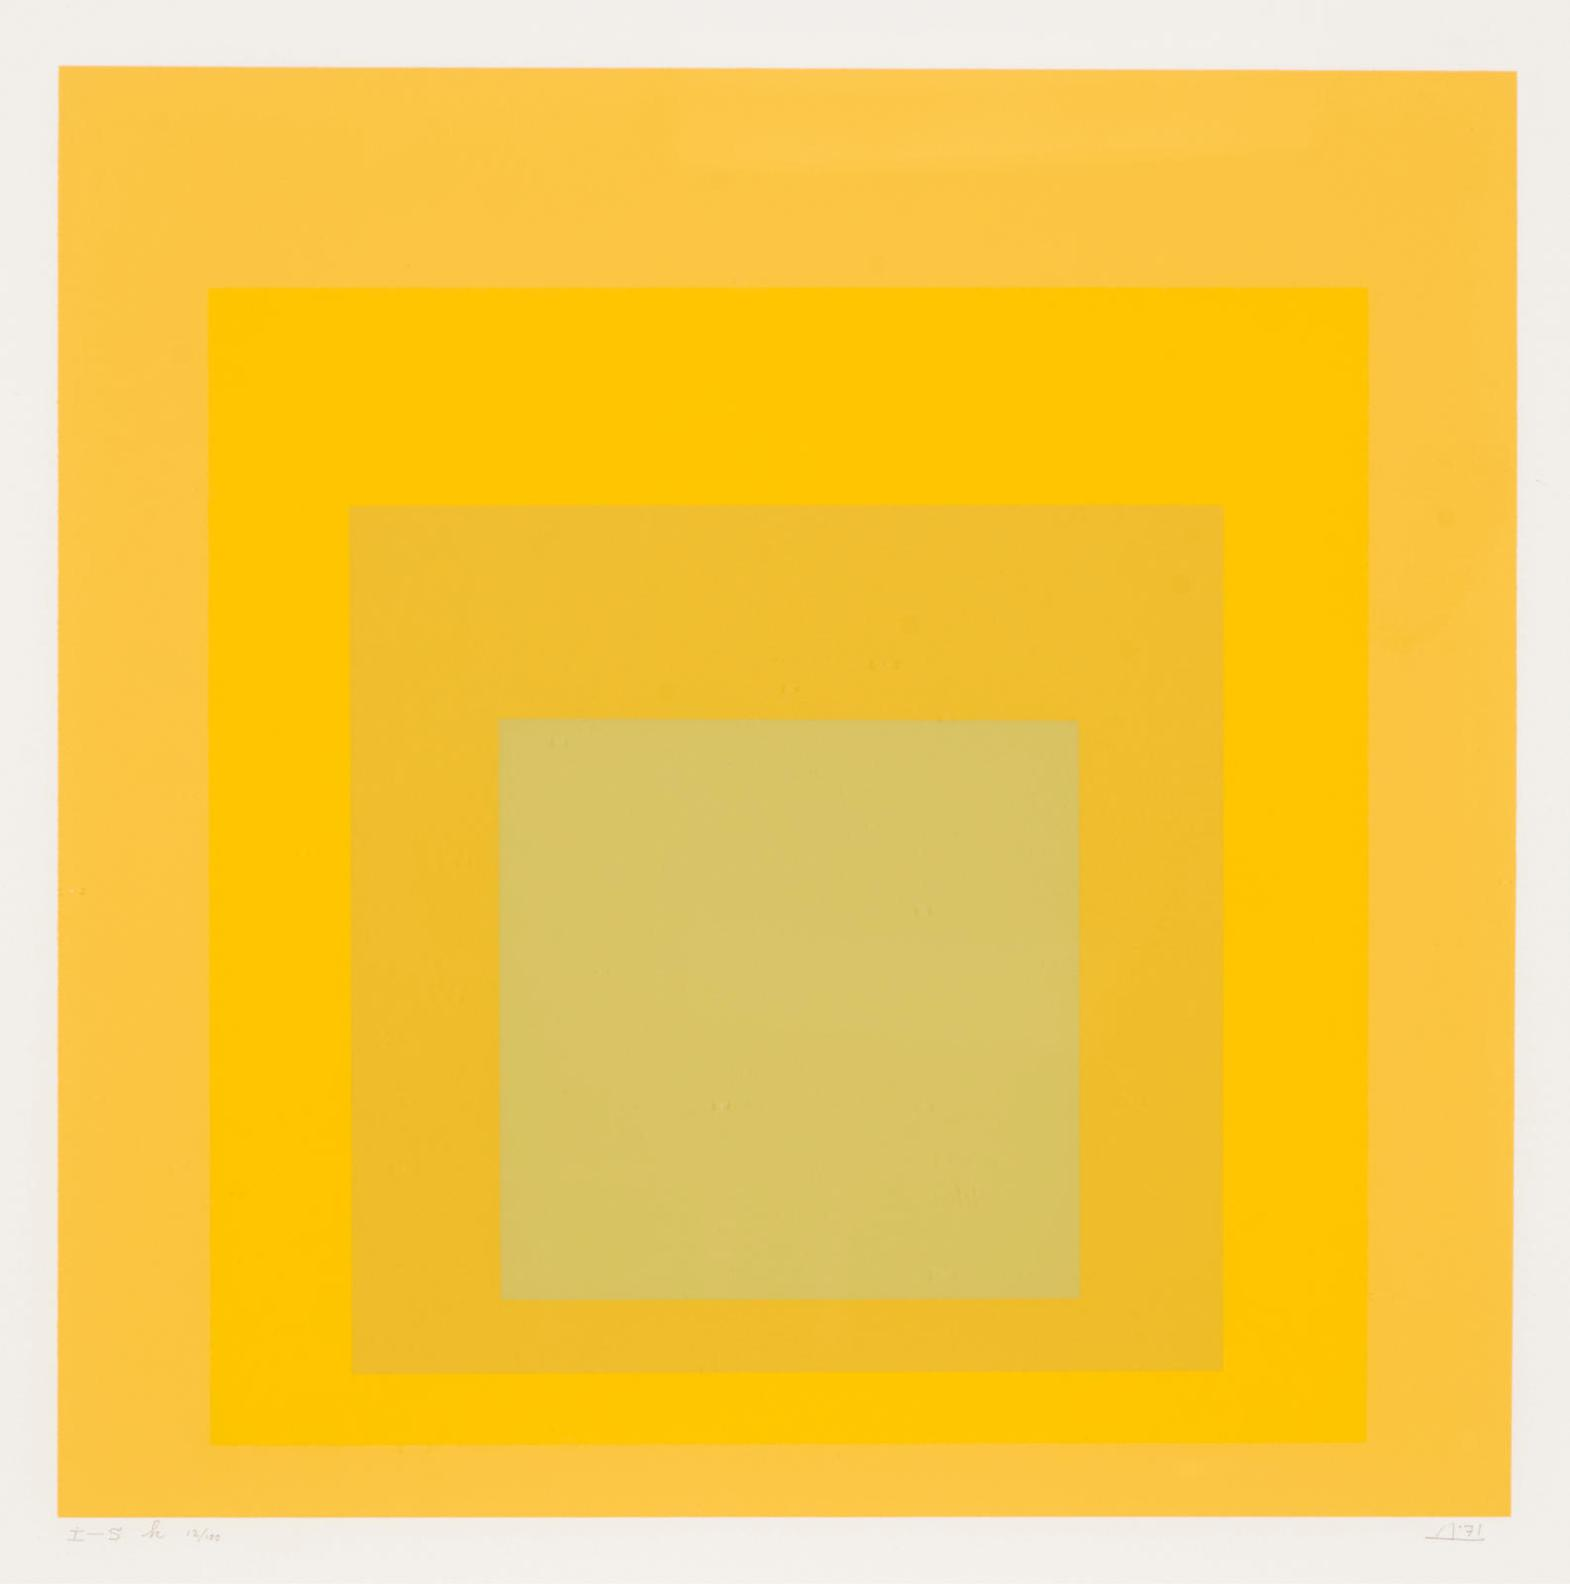 Josef Albers-I-S H-1971